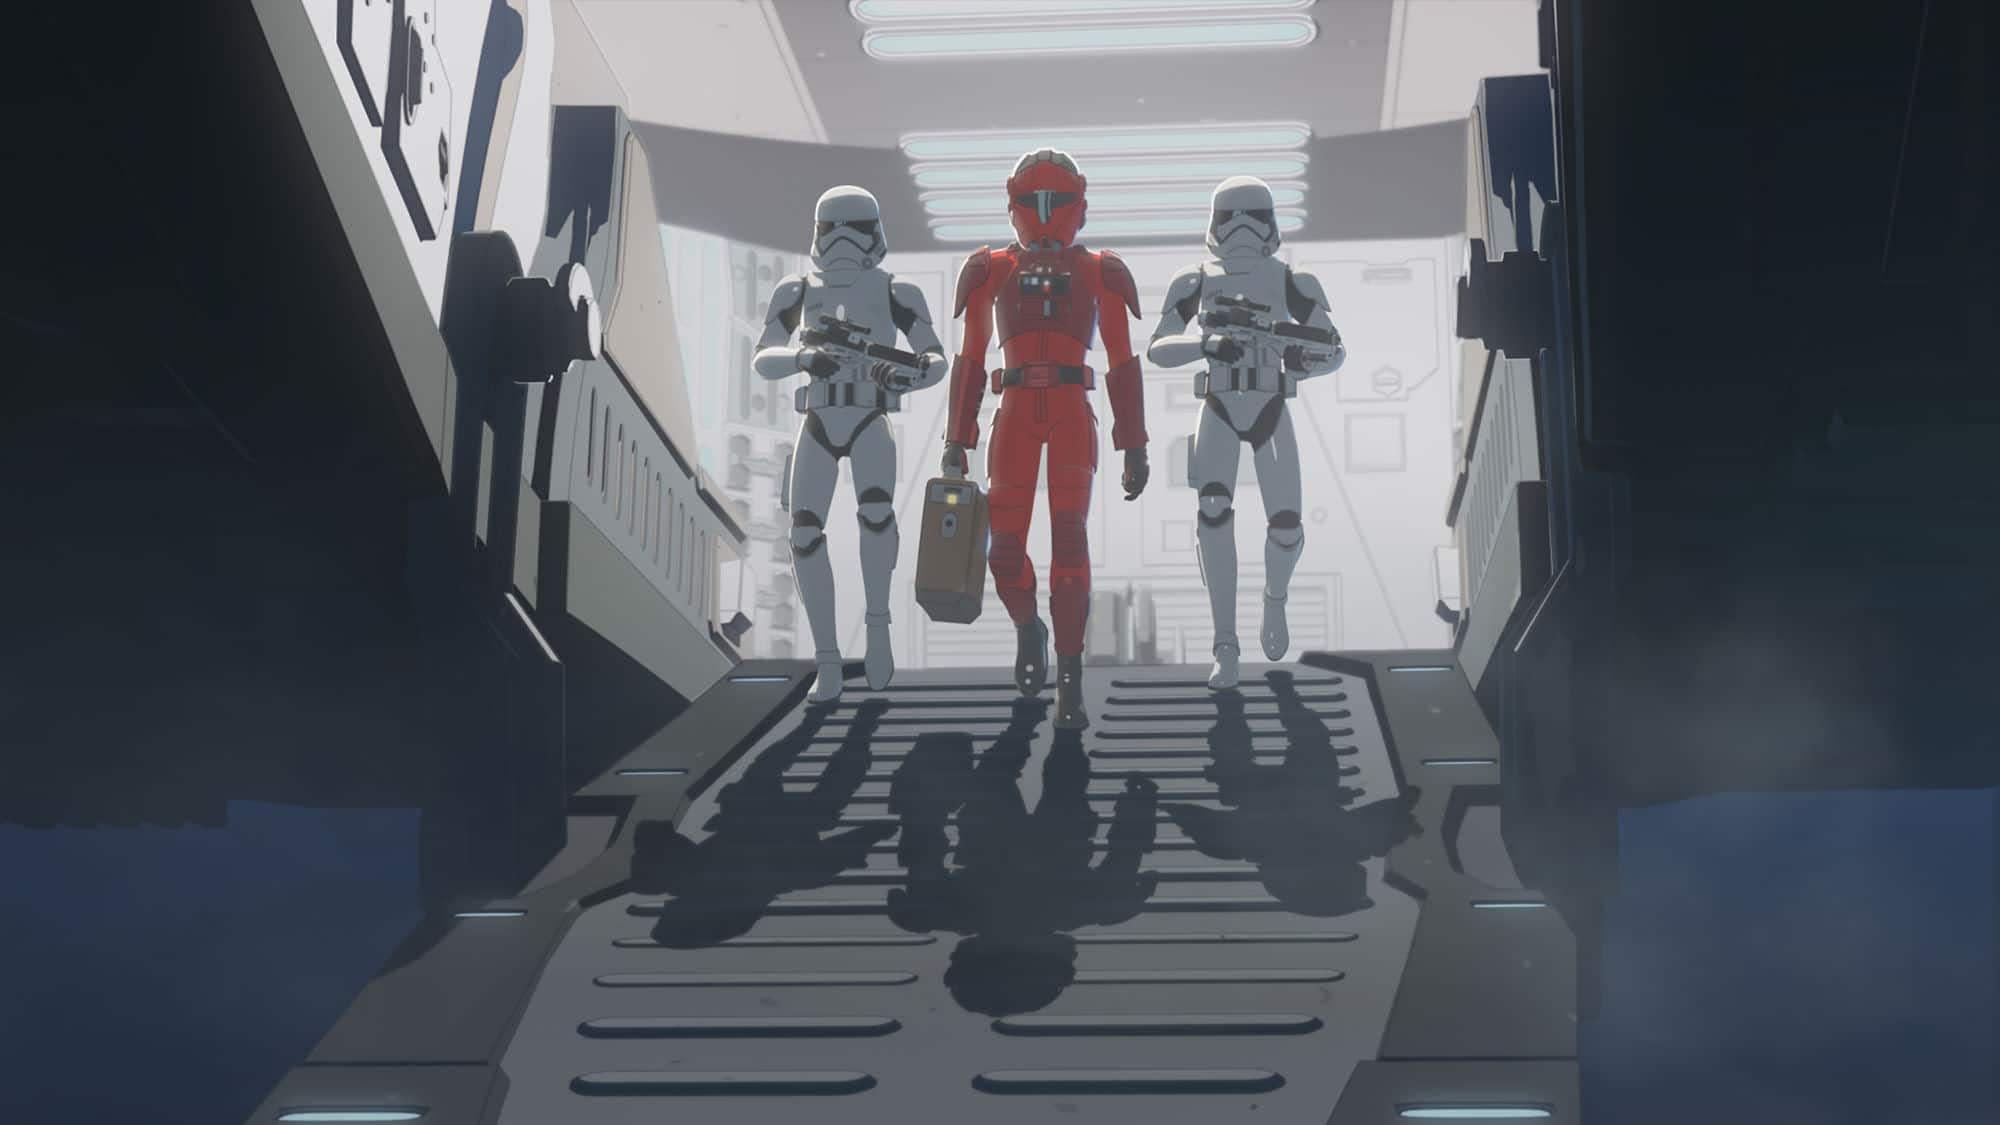 'Star Wars Resistance': A Microcosm of the Prequel Trilogy (Sans Jedi) [REVIEW]